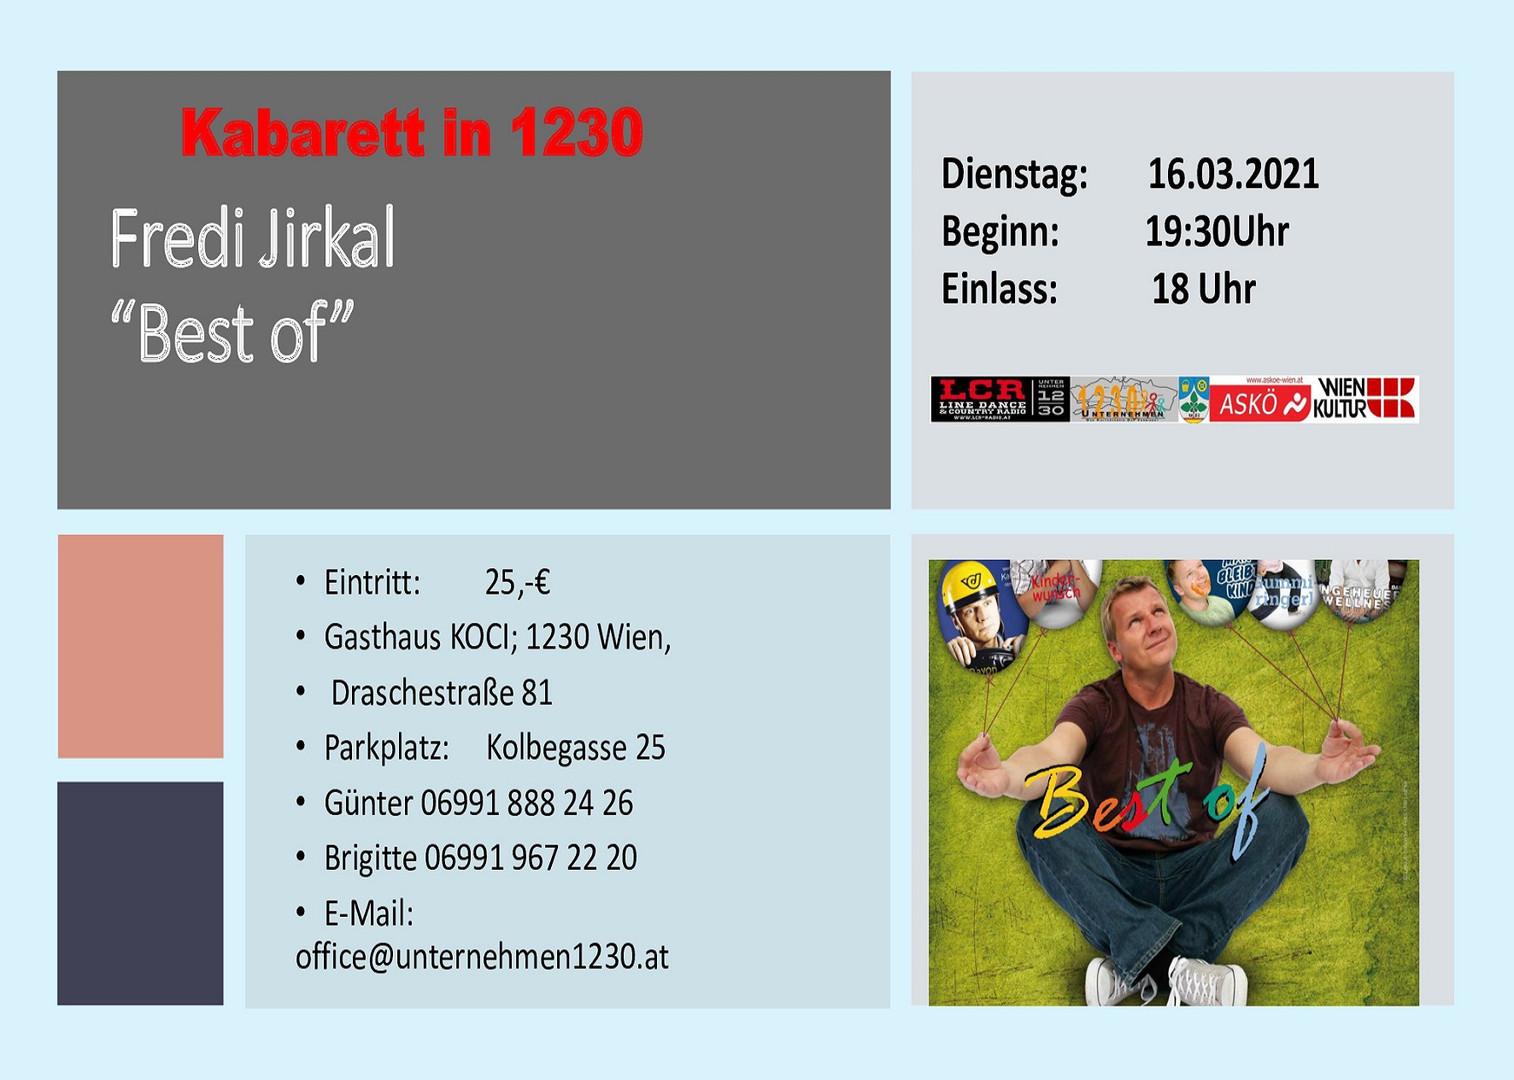 6.-Fredi-Jirkal-16.03.2020-A6.jpg